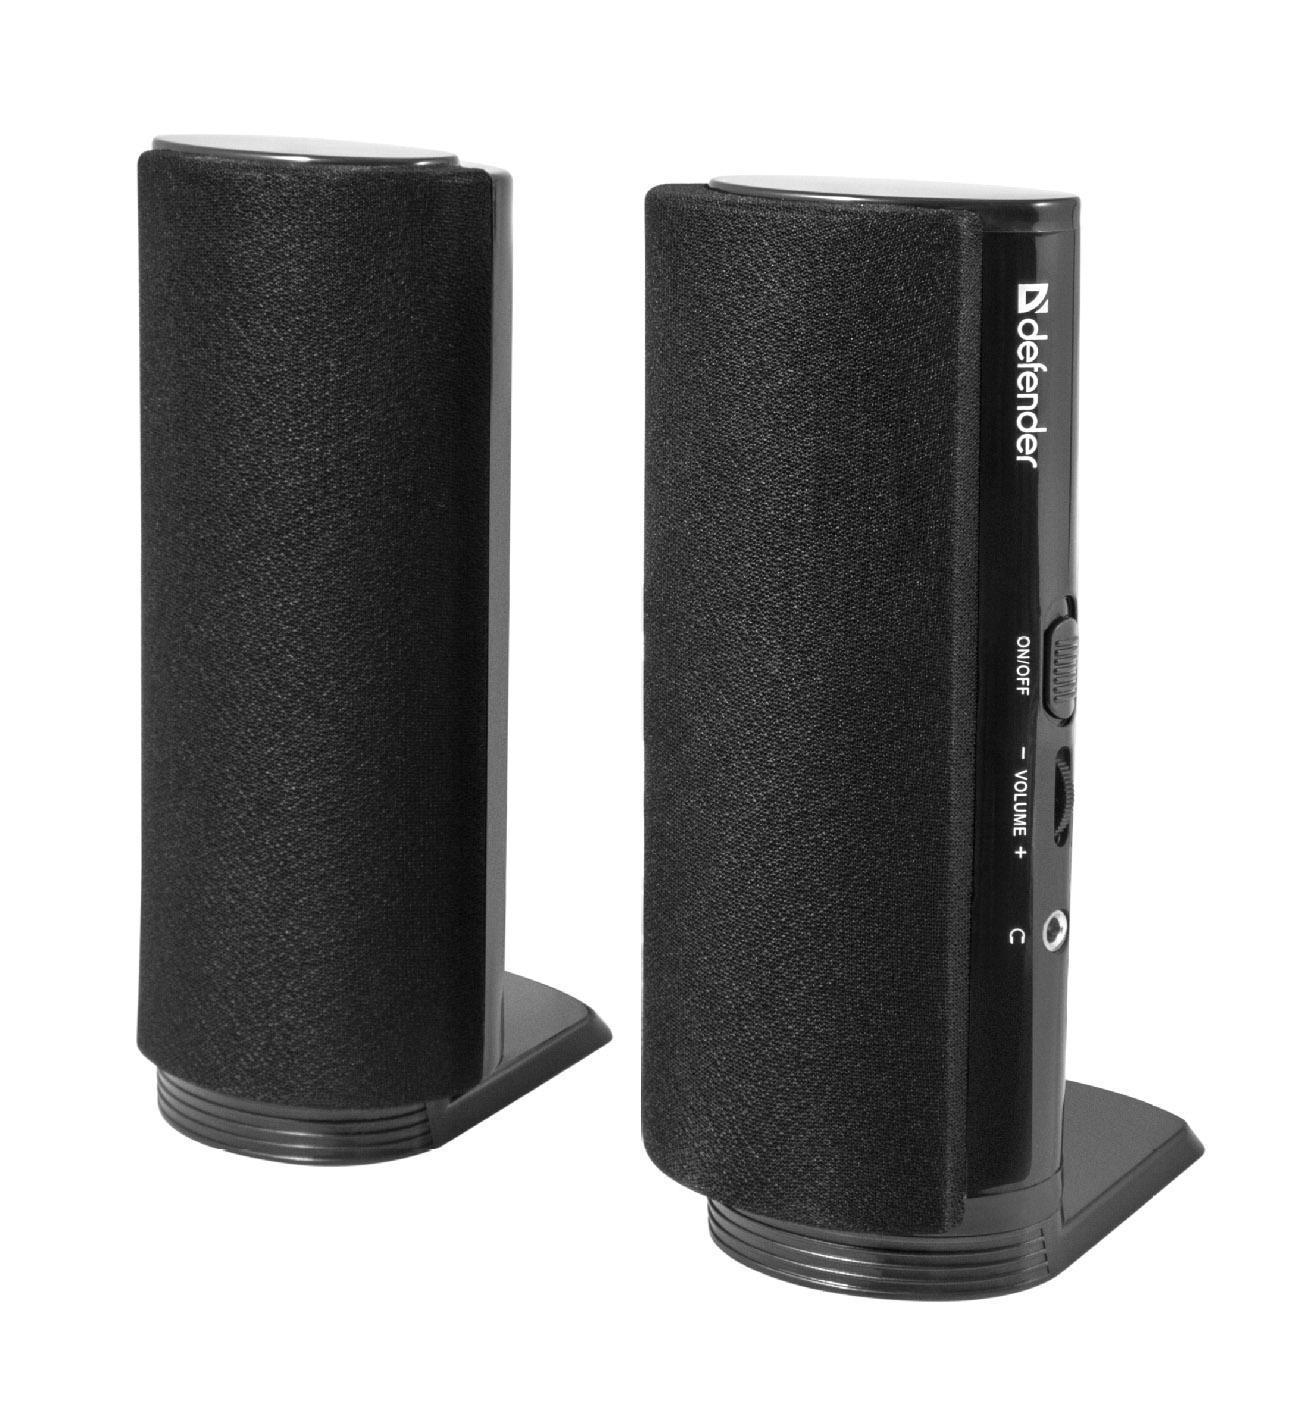 Компьютерная акустика SPK-210 цена